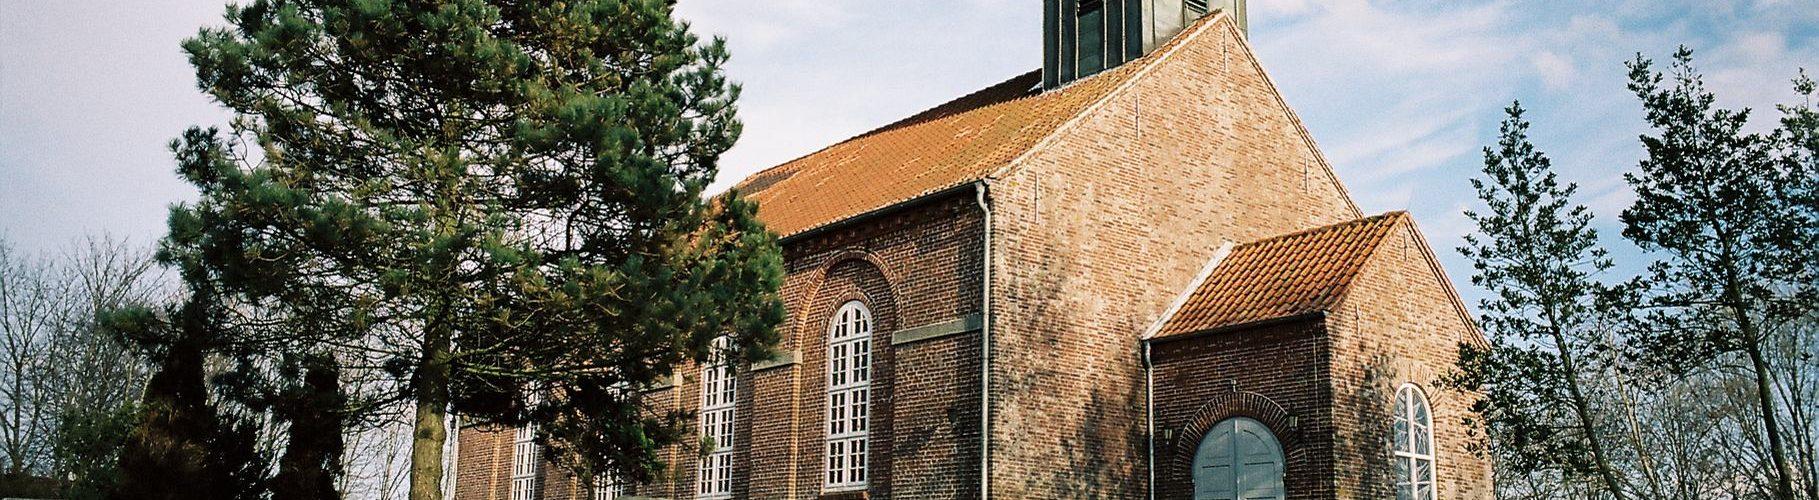 Kirche St. Salvator Simonsberg |©weites.land